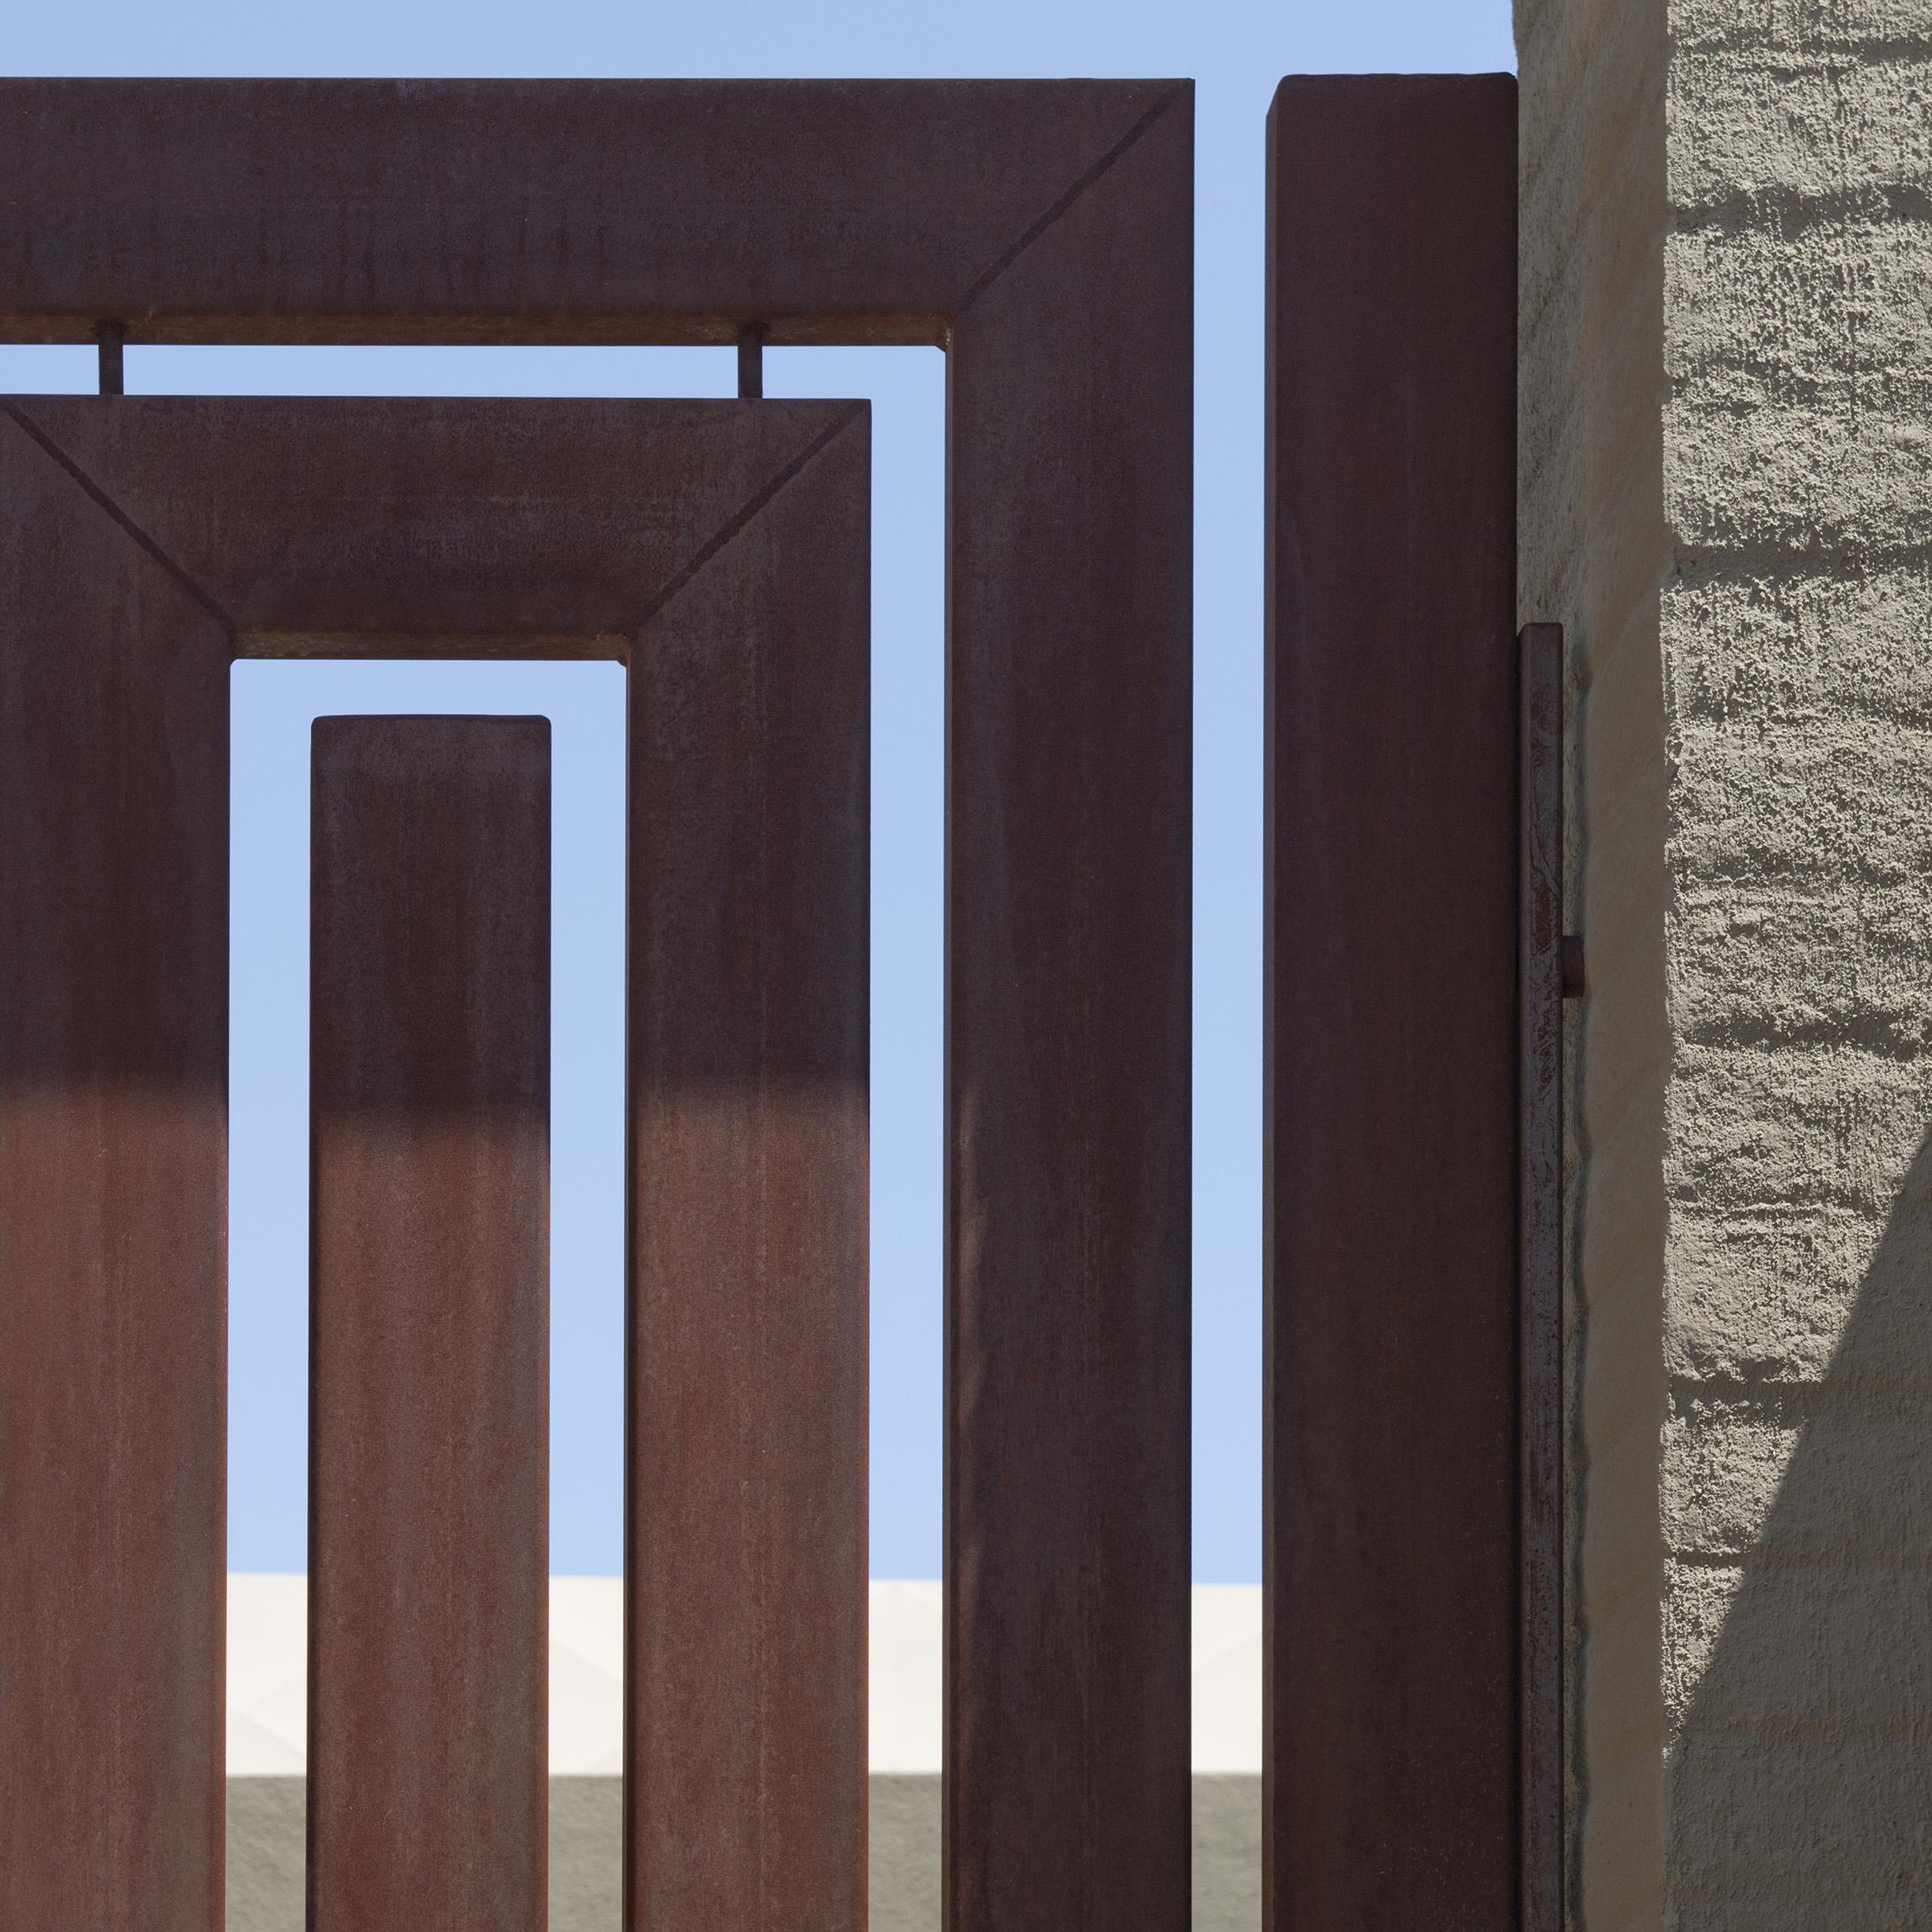 Pontatoc Residence Remodel: Tucson, Arizona